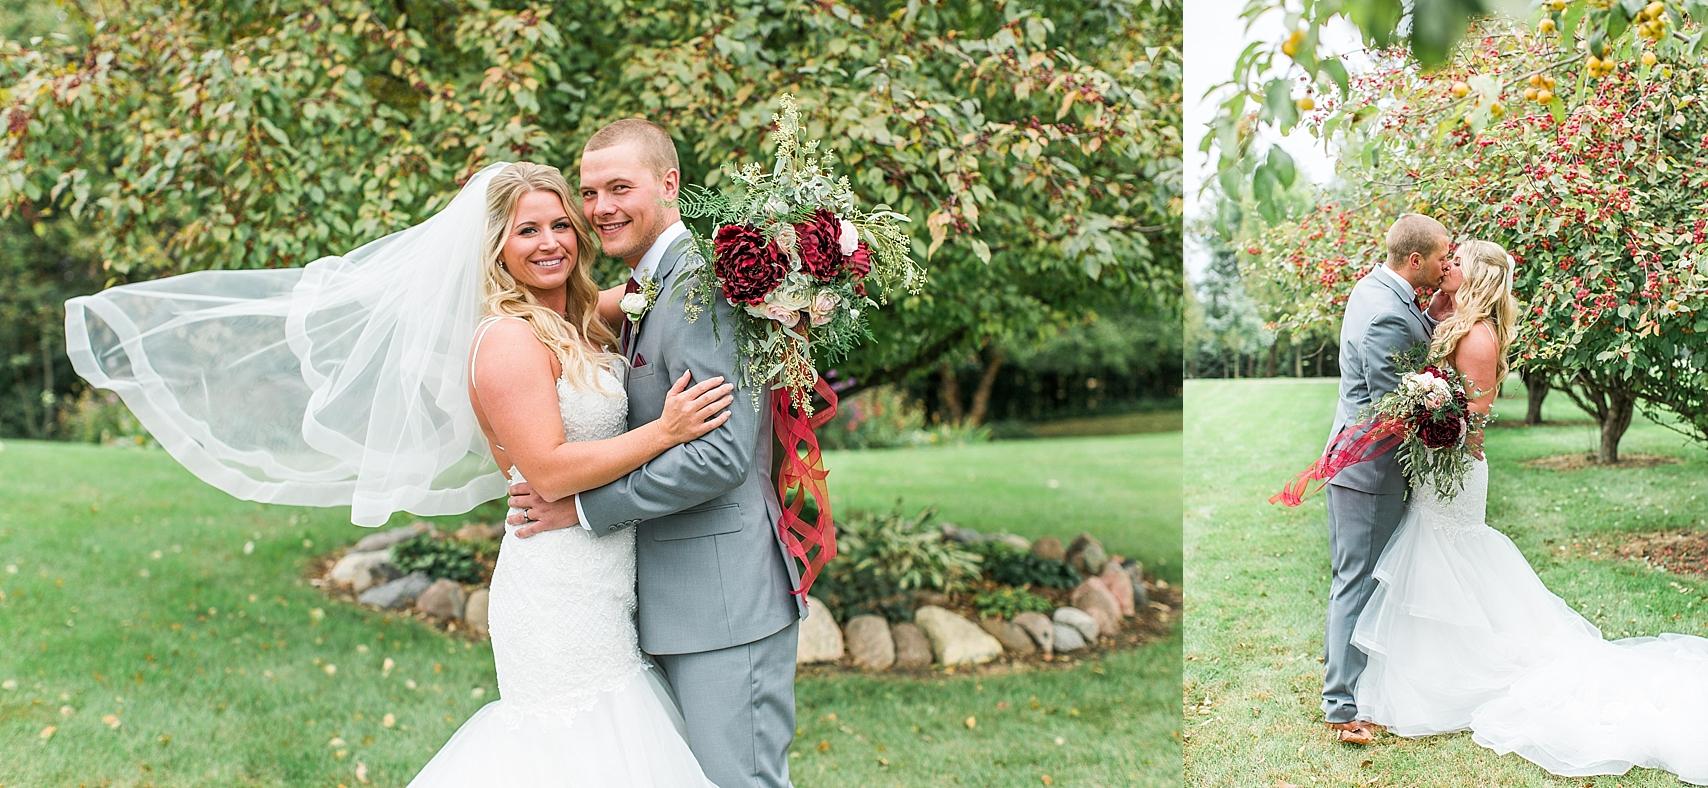 Minnesota Minneapolis Wedding Photographer Best Of 2018 Weddings Mallory Kiesow Photography_0197.jpg